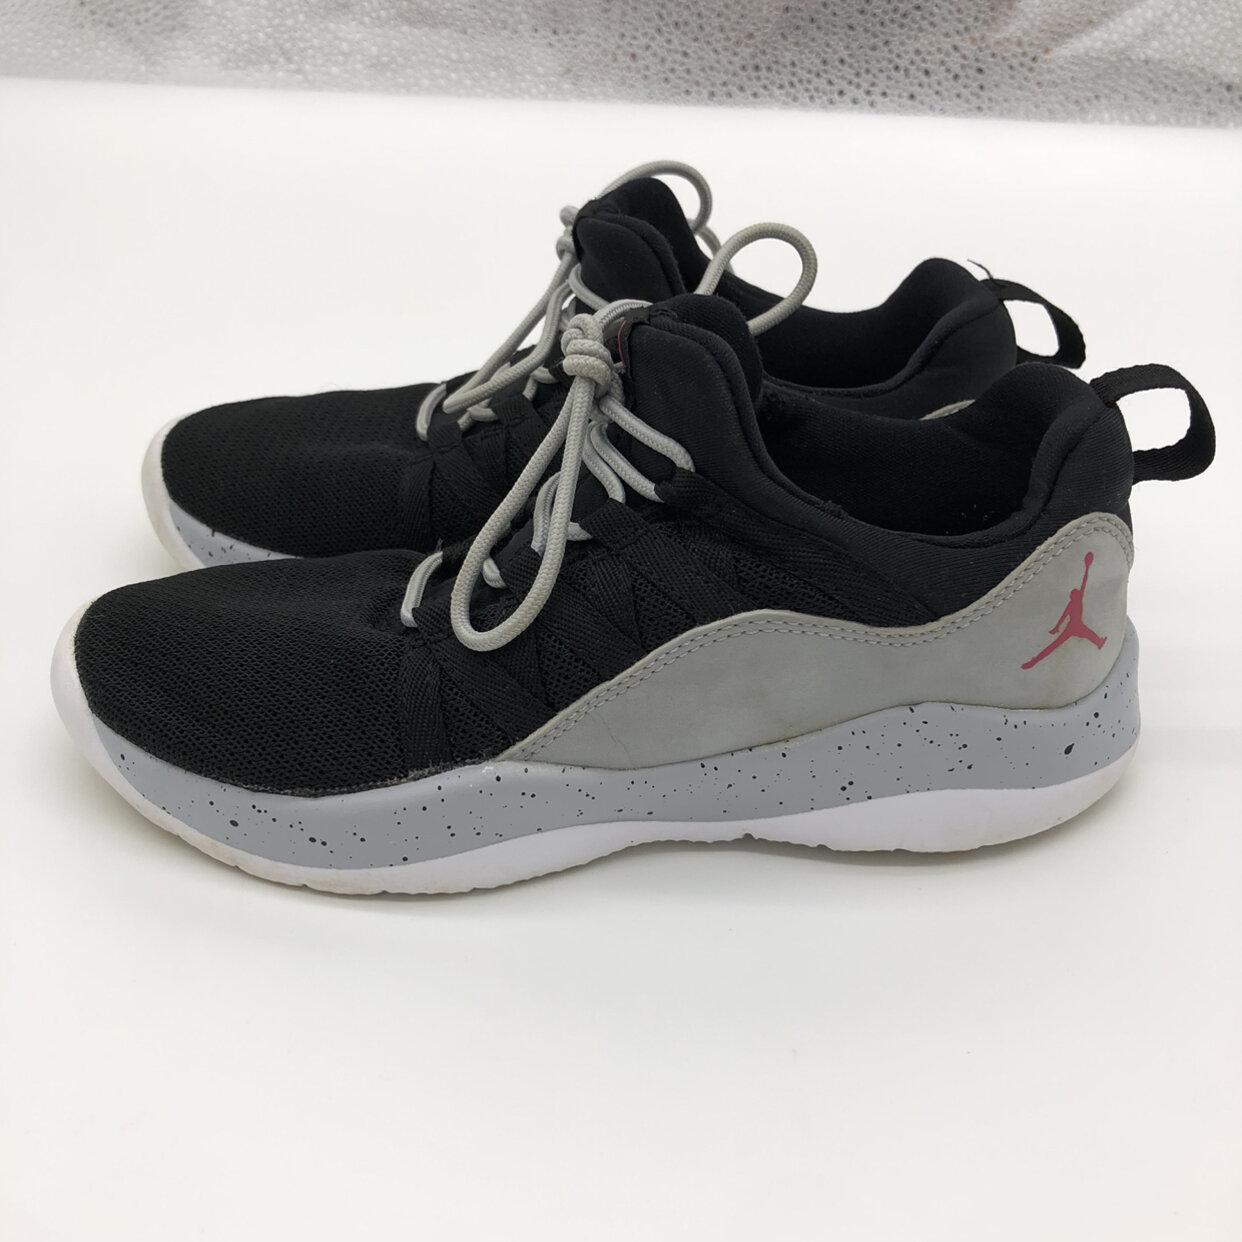 Nike Air Jordan Deca Fly Girls Youth Sneakers Shoes 13.5